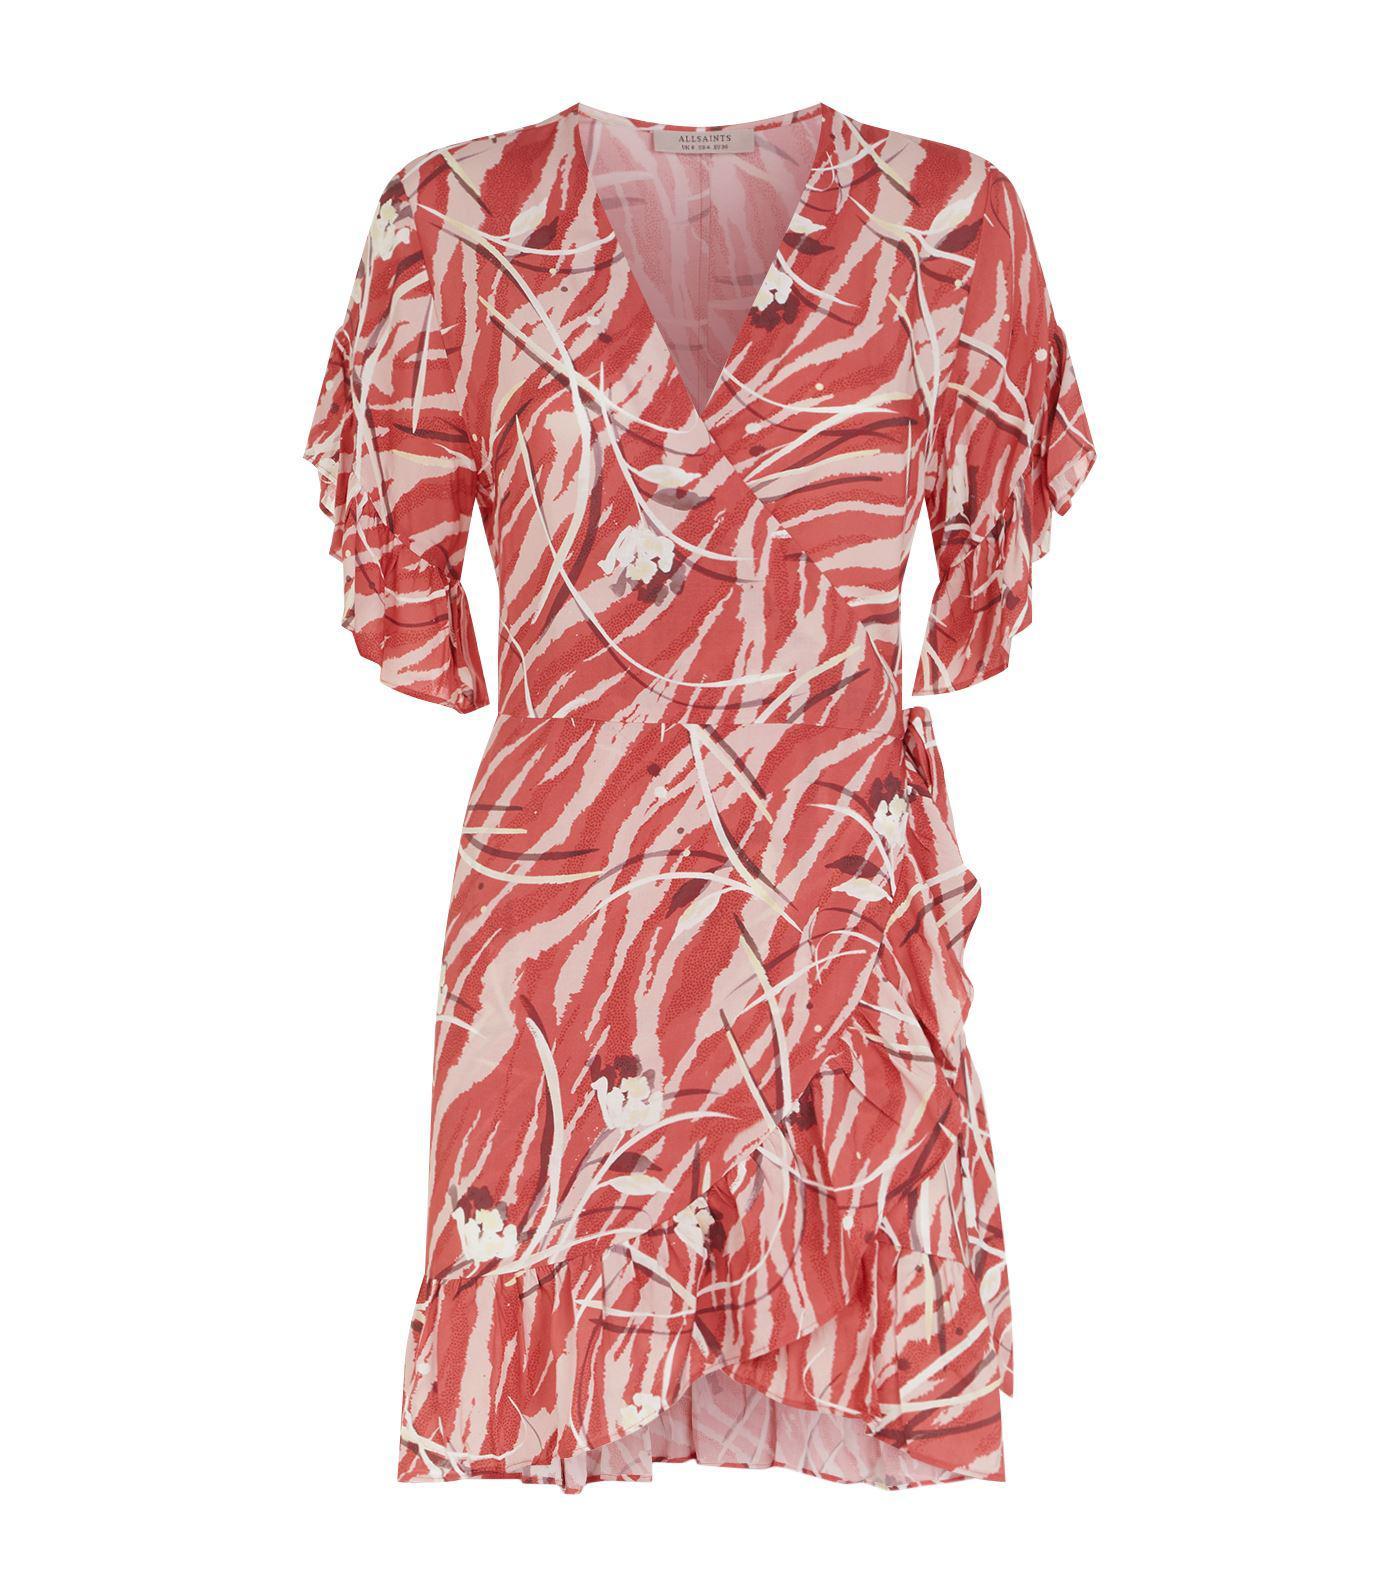 Allsaints Marlow Kazuno Dress In Red Lyst